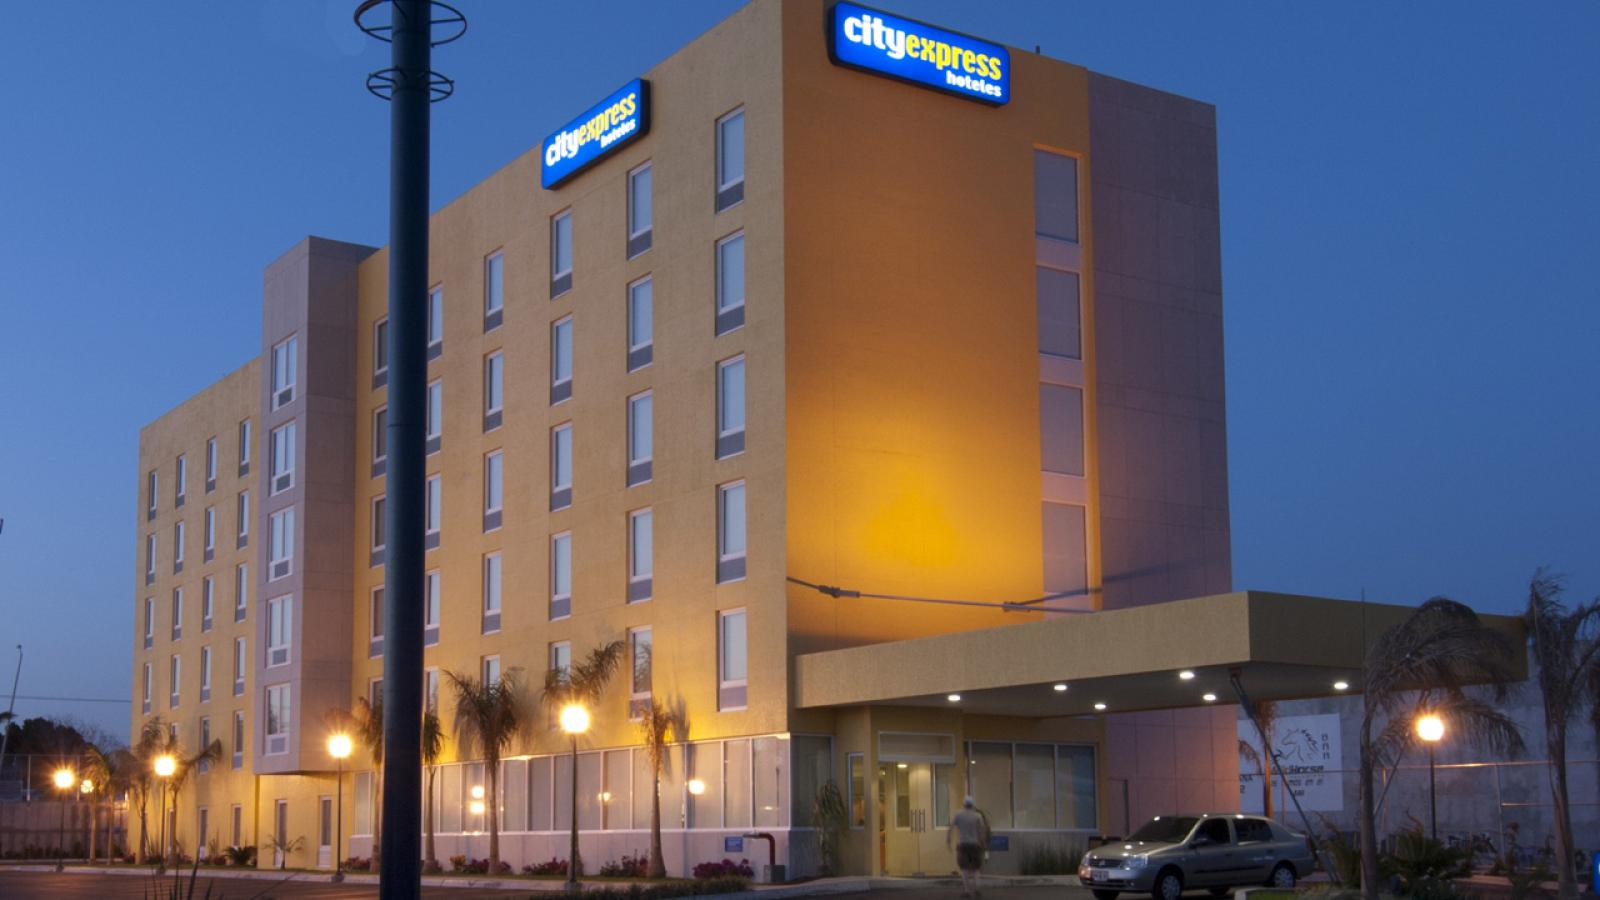 City Express Hermosillo Hotels